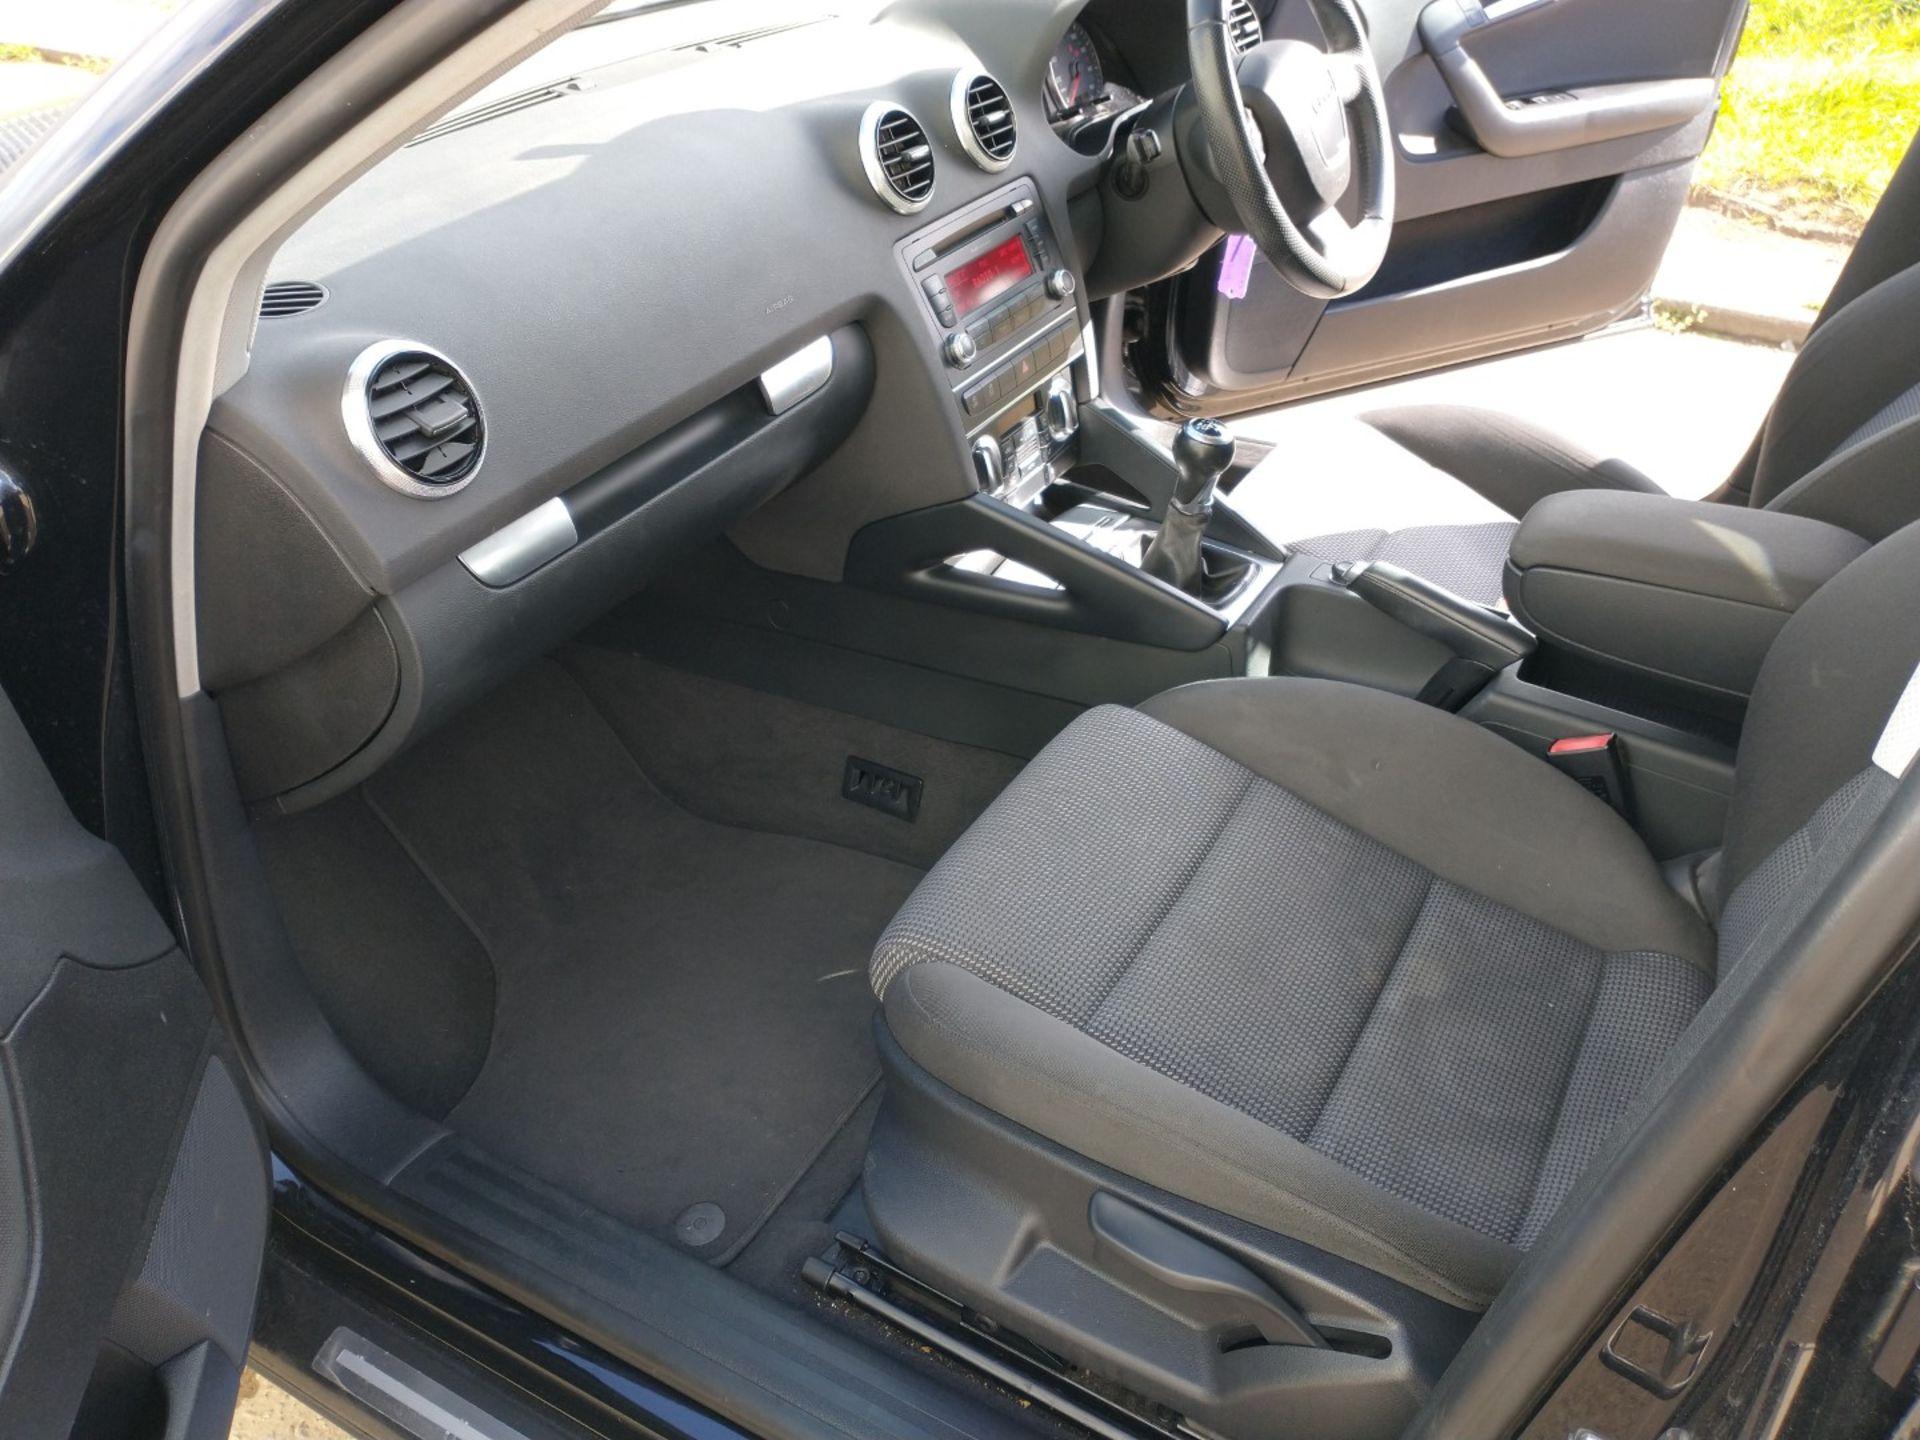 2012 Audi A3 Sportback 1.6 Tdi Hatchback - Full Service History - CL505 - NO VAT ON THE HAMMER - - Image 15 of 26